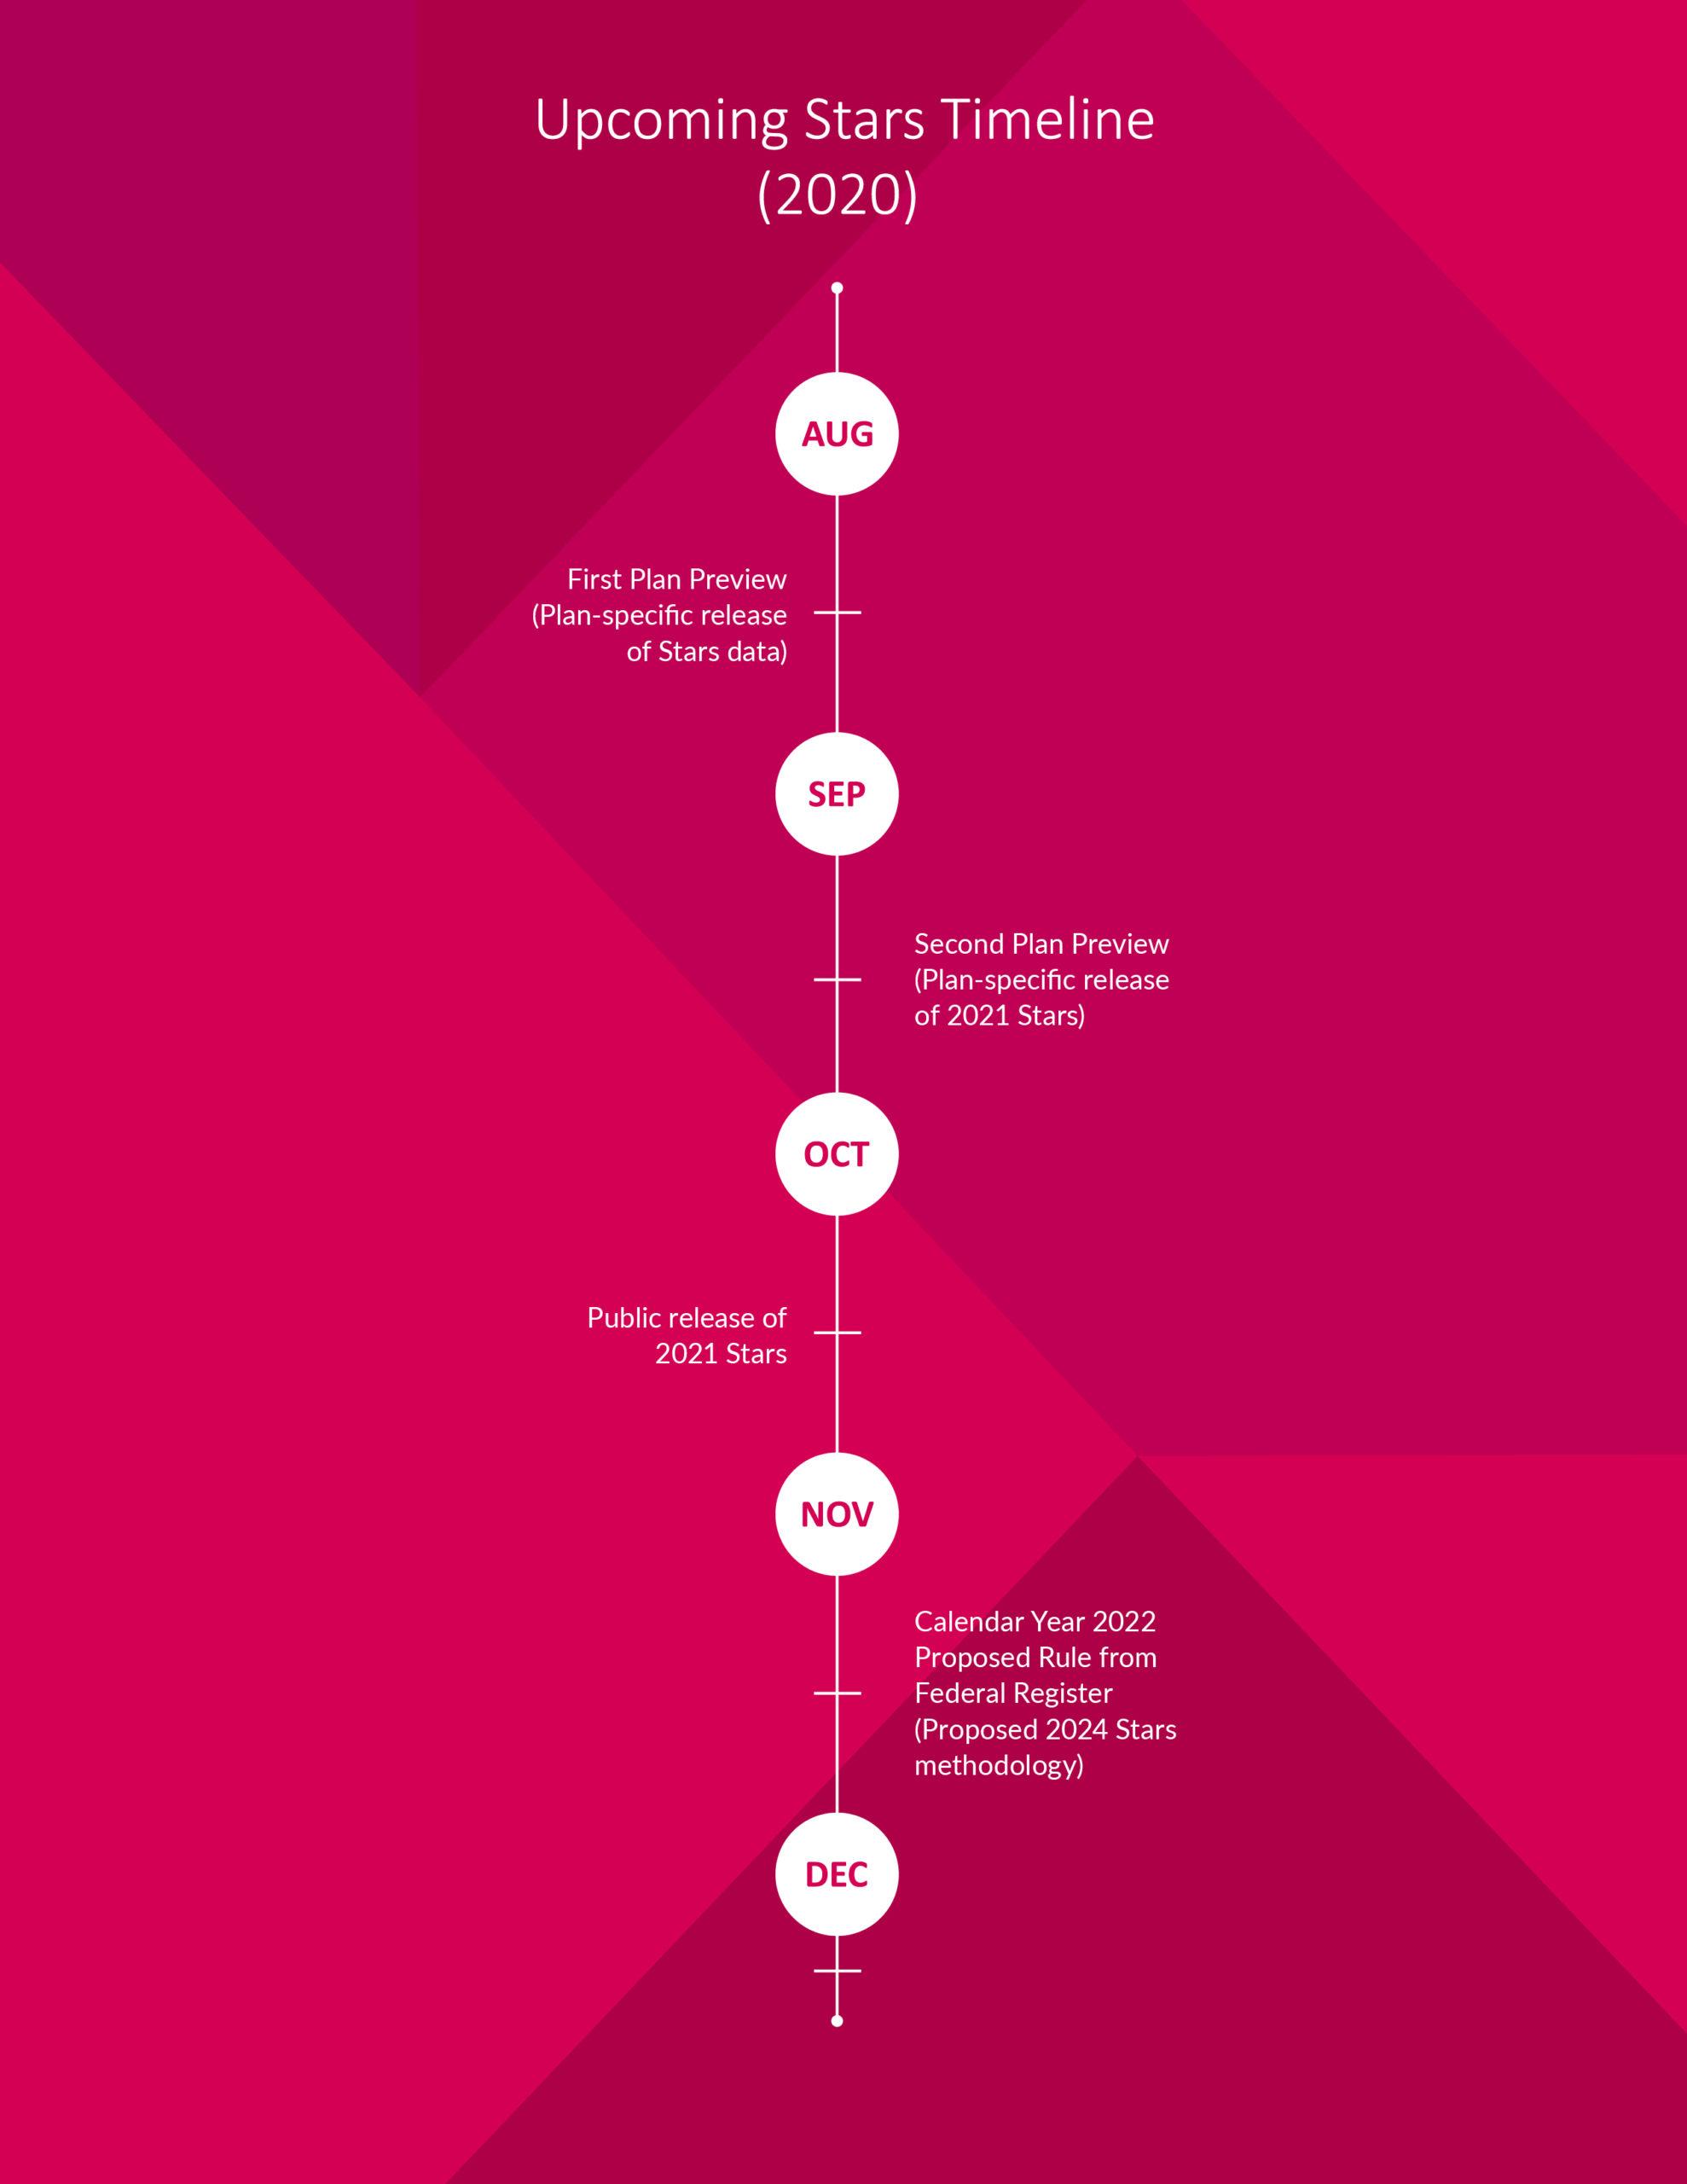 timeline of important dates for Medicare Advantage Star Ratings